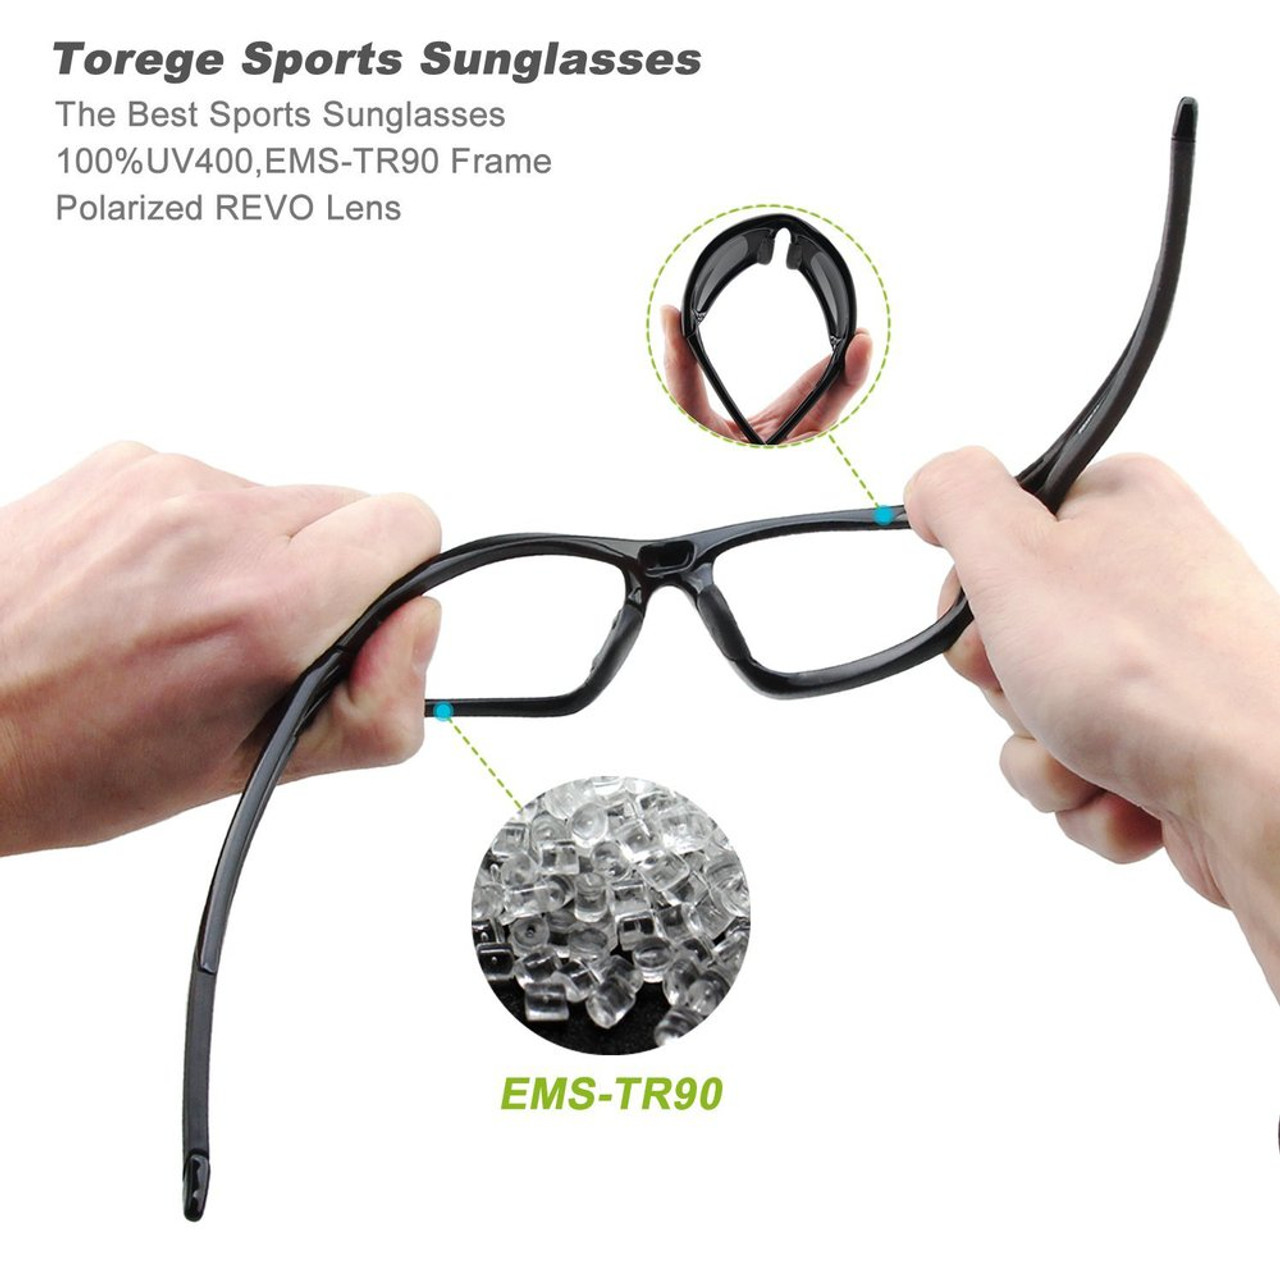 41d301ea39 ... TOREGE Men s Fashion Polarized Sunglasses For Driving Glasses TR90  Unbreakable Frame Eyewear Unisex 100% UV400 ...